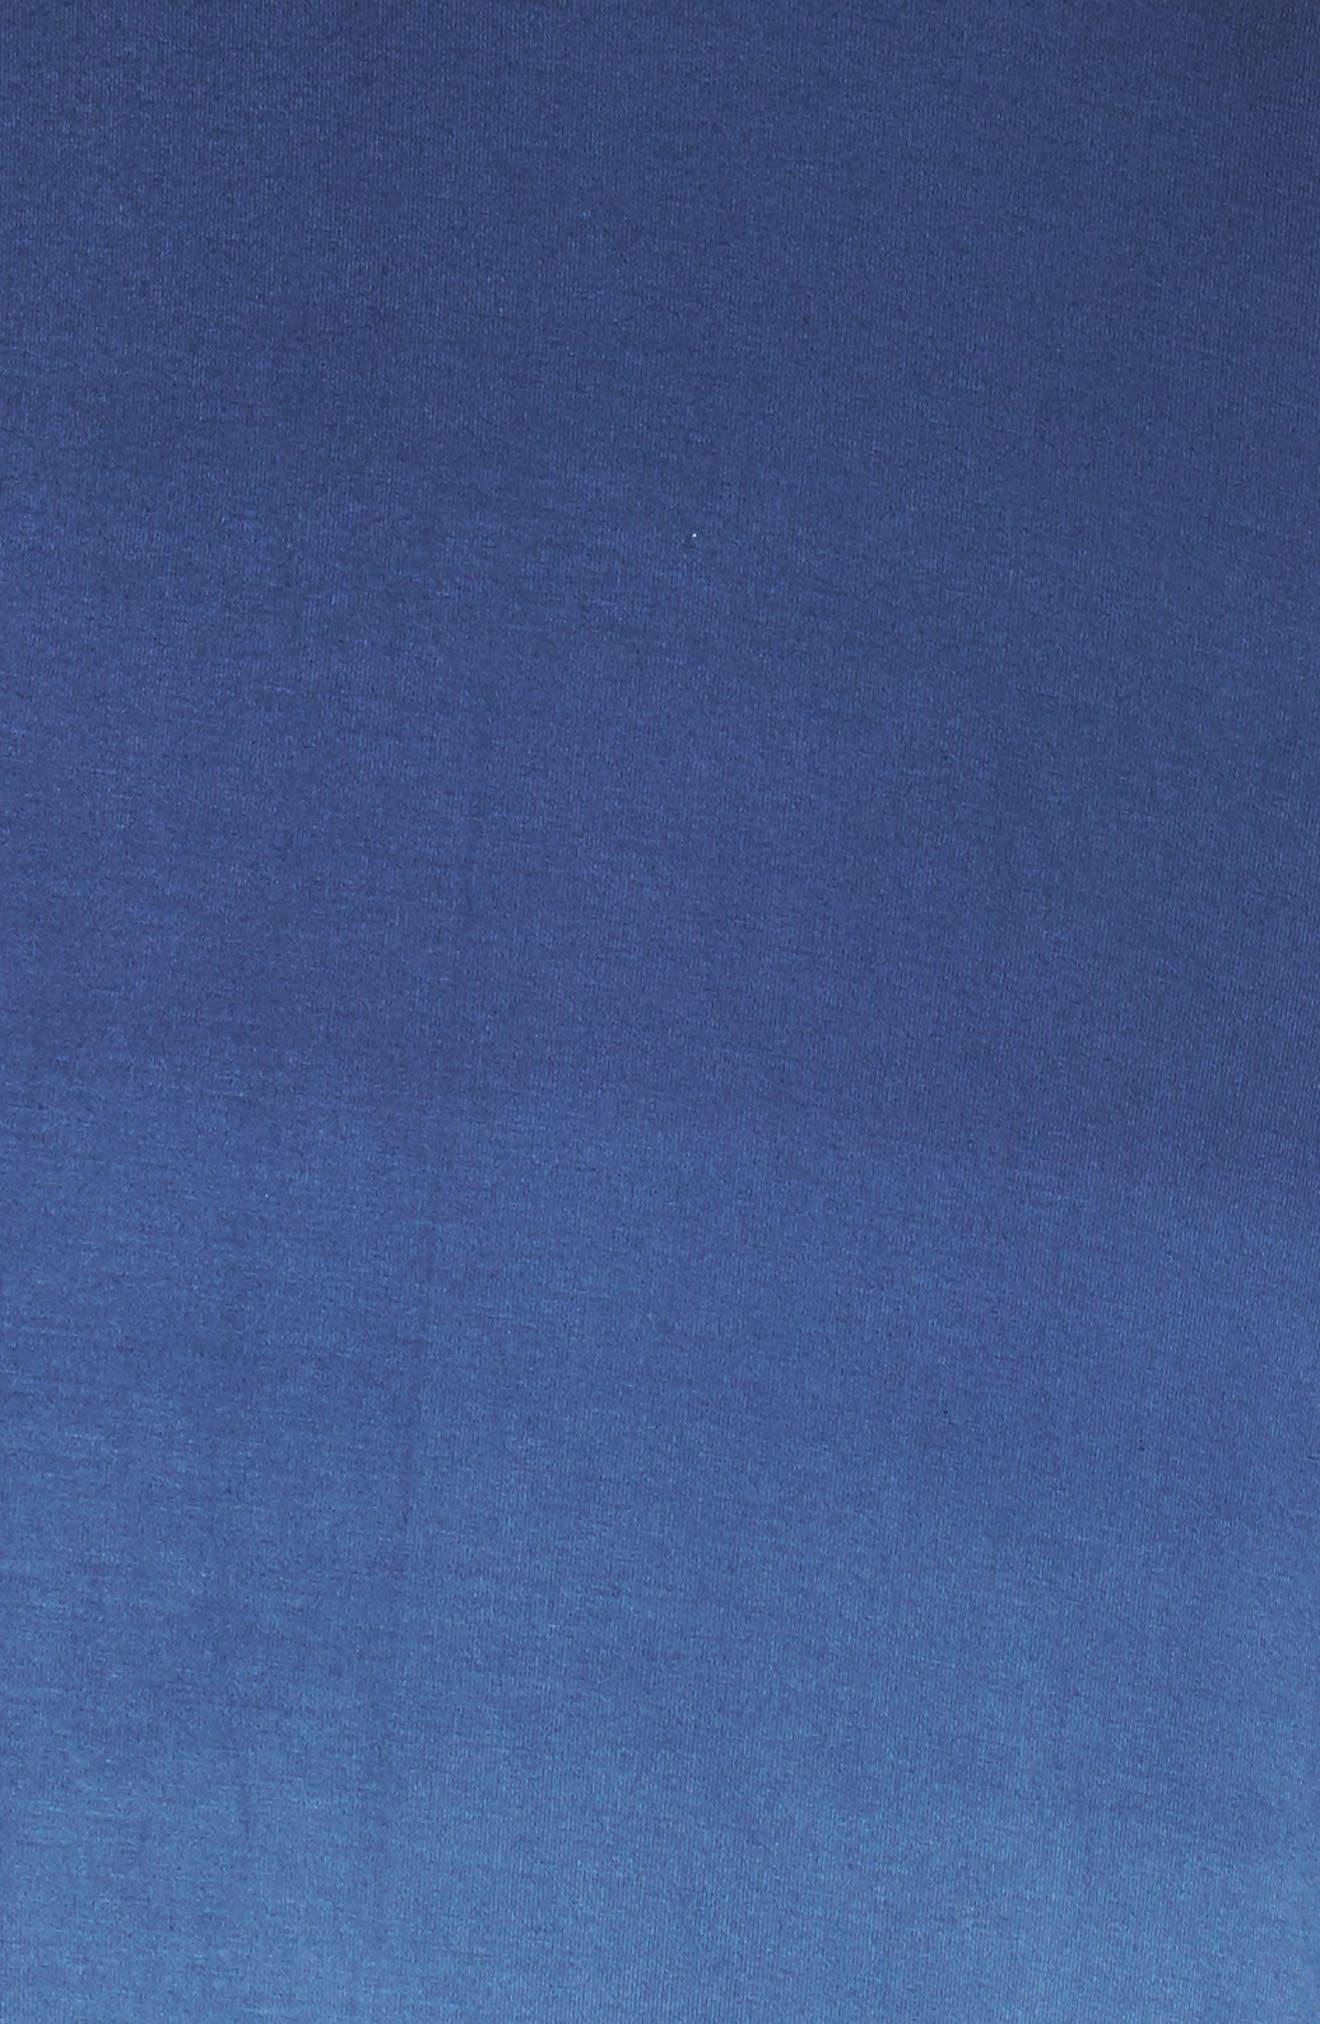 Racerback Maxi Dress,                             Alternate thumbnail 5, color,                             400